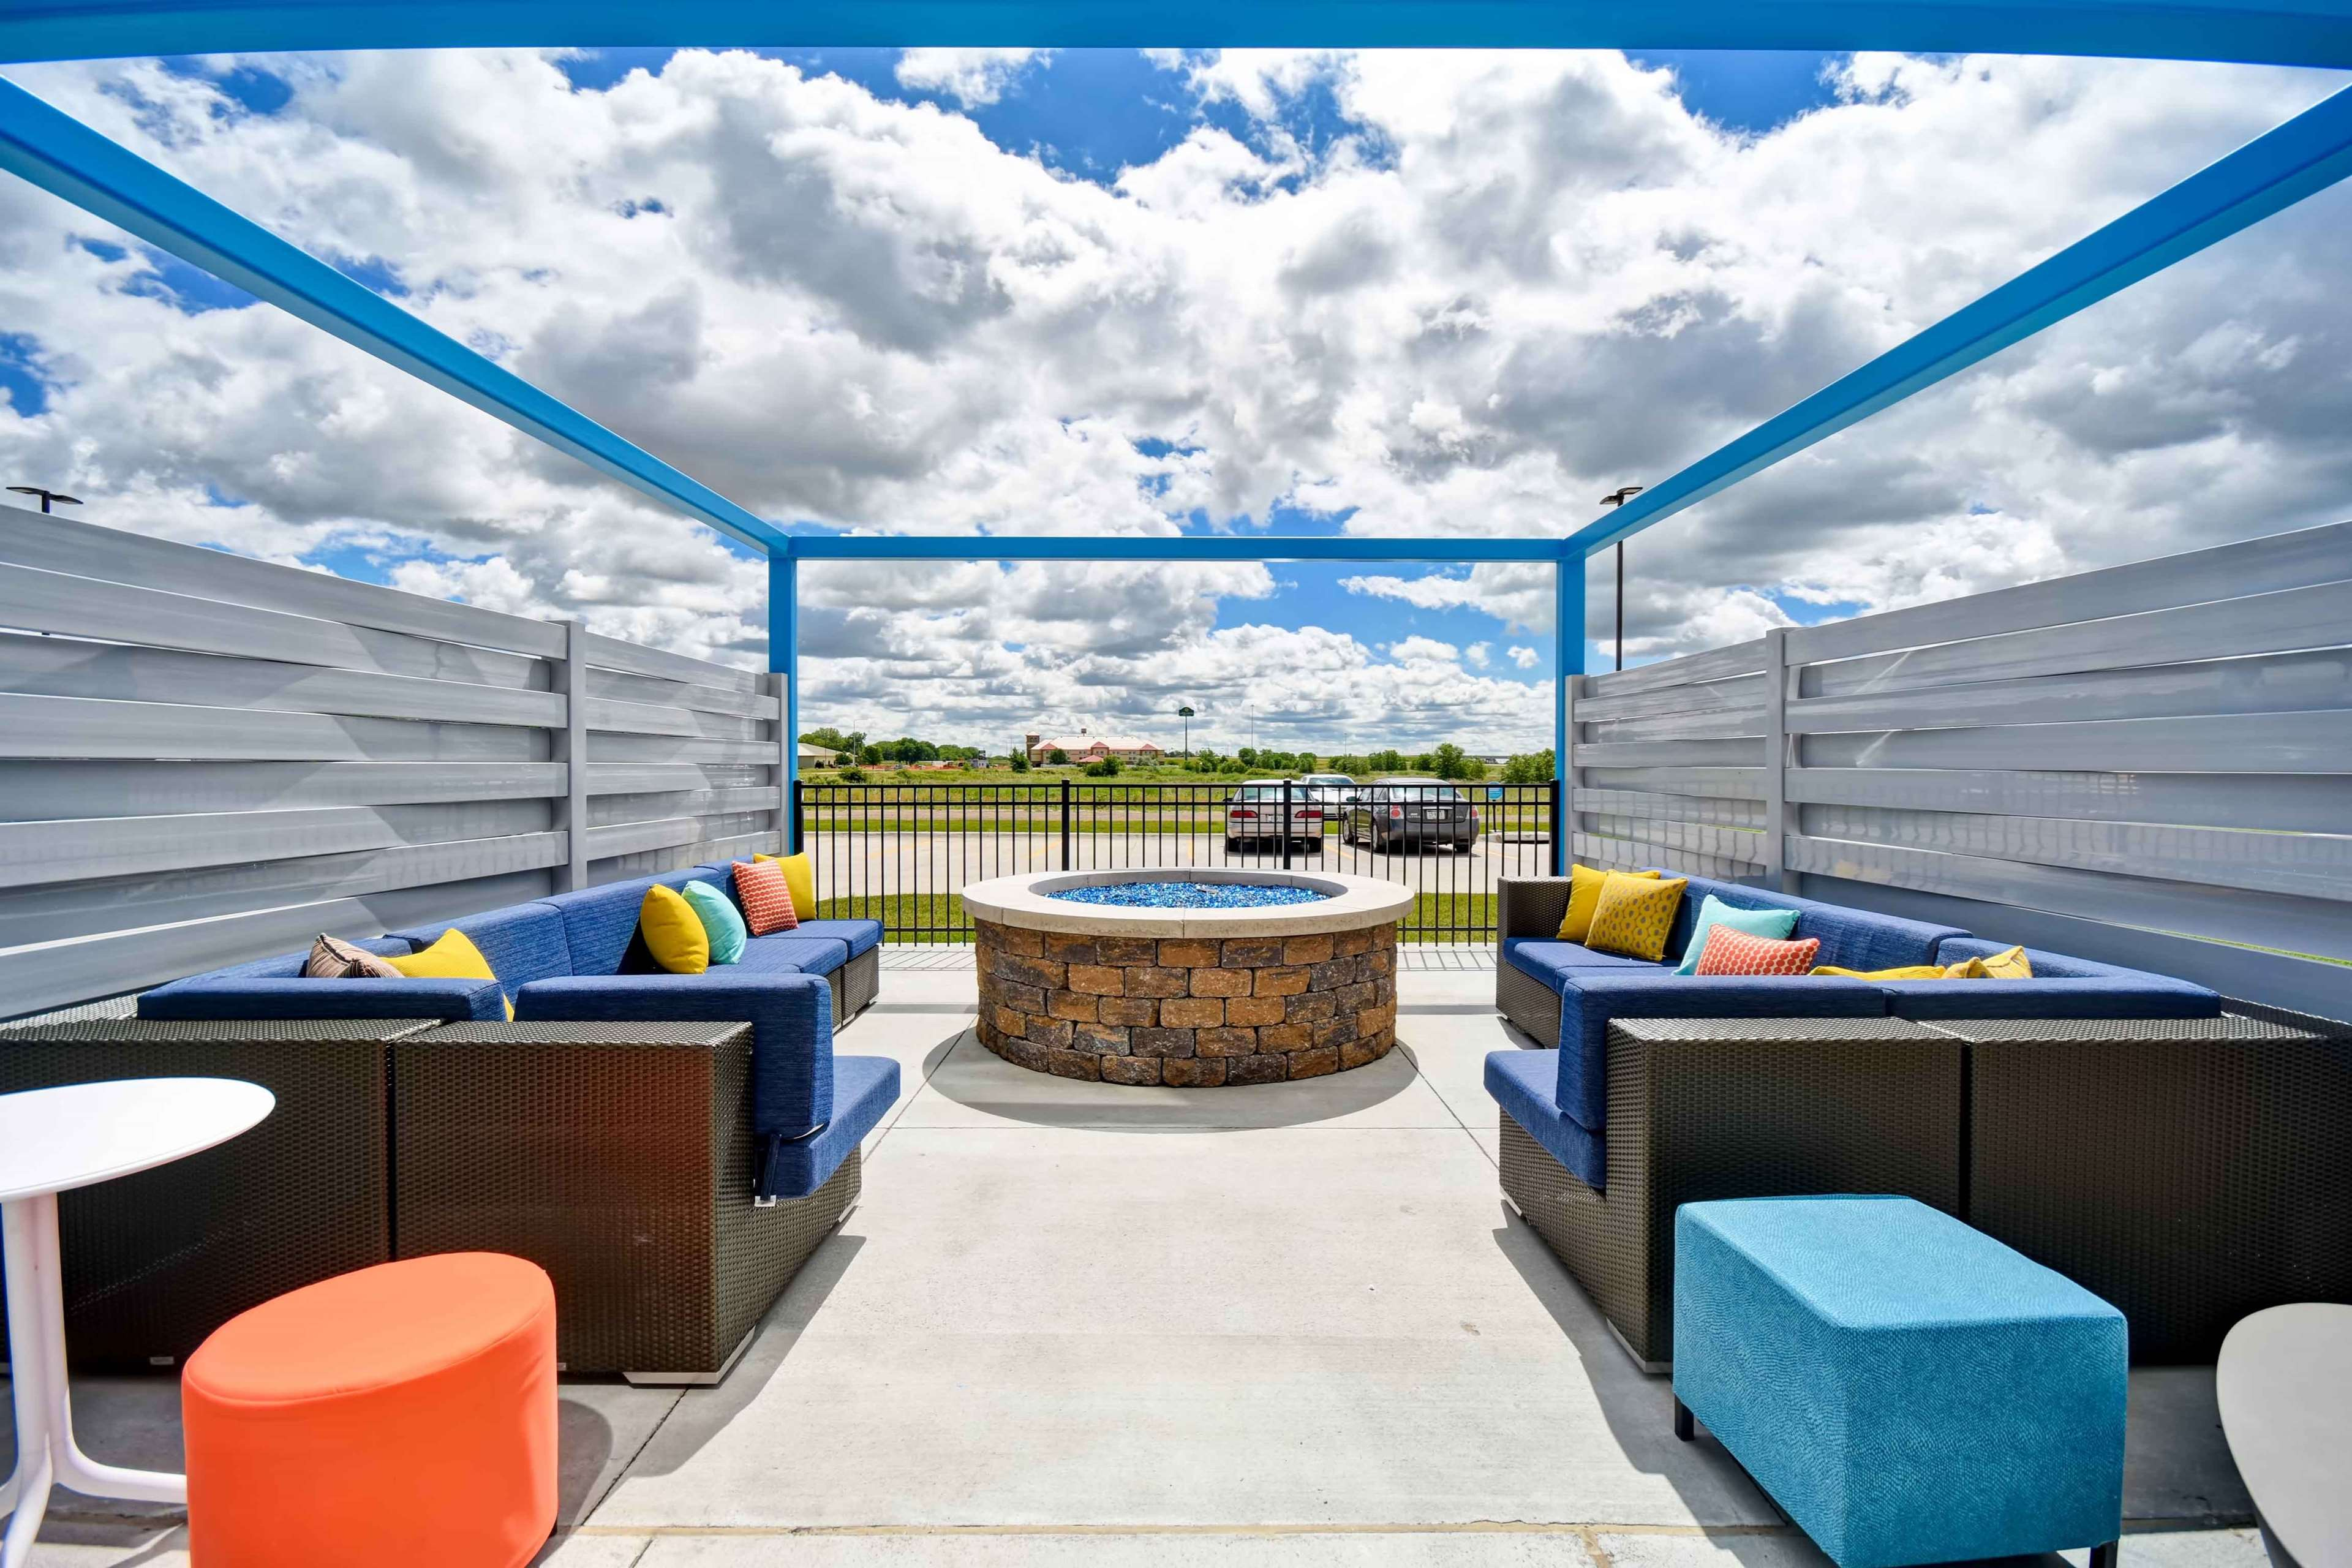 Tru by Hilton North Platte image 15